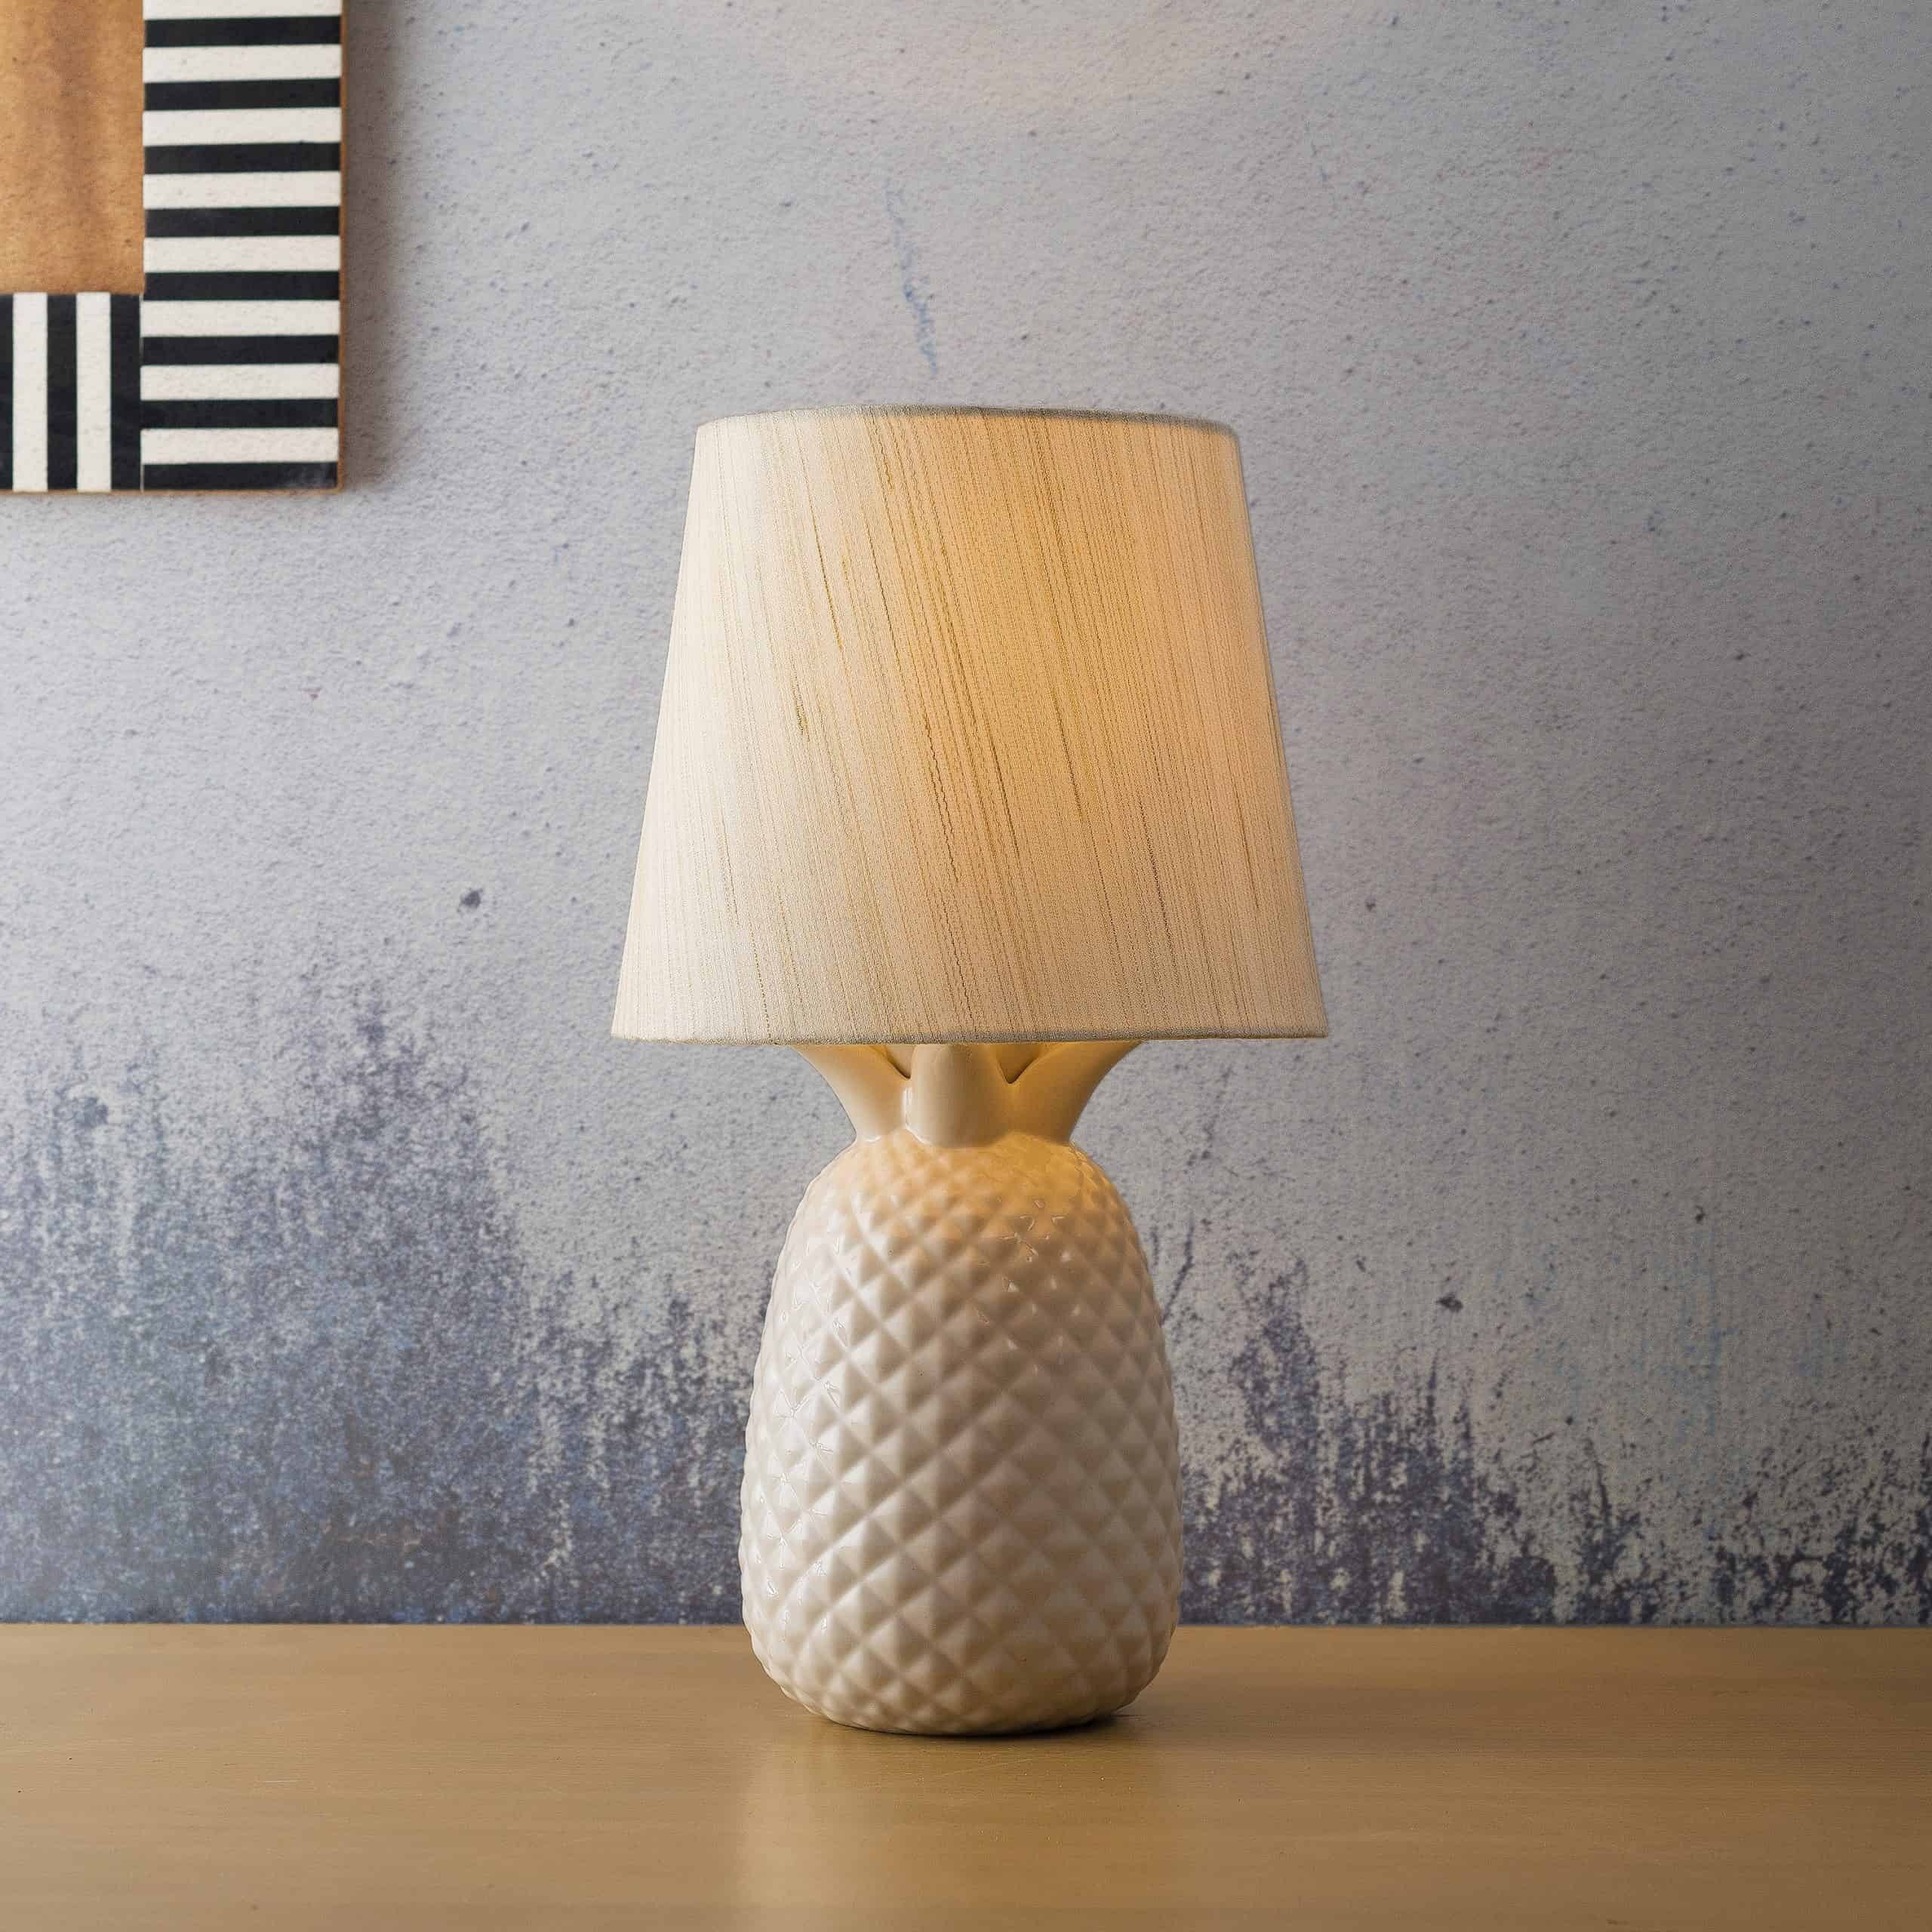 LED Table Lamp Modern Creative Design Bedside Lighting Bedroom Circle Warm white